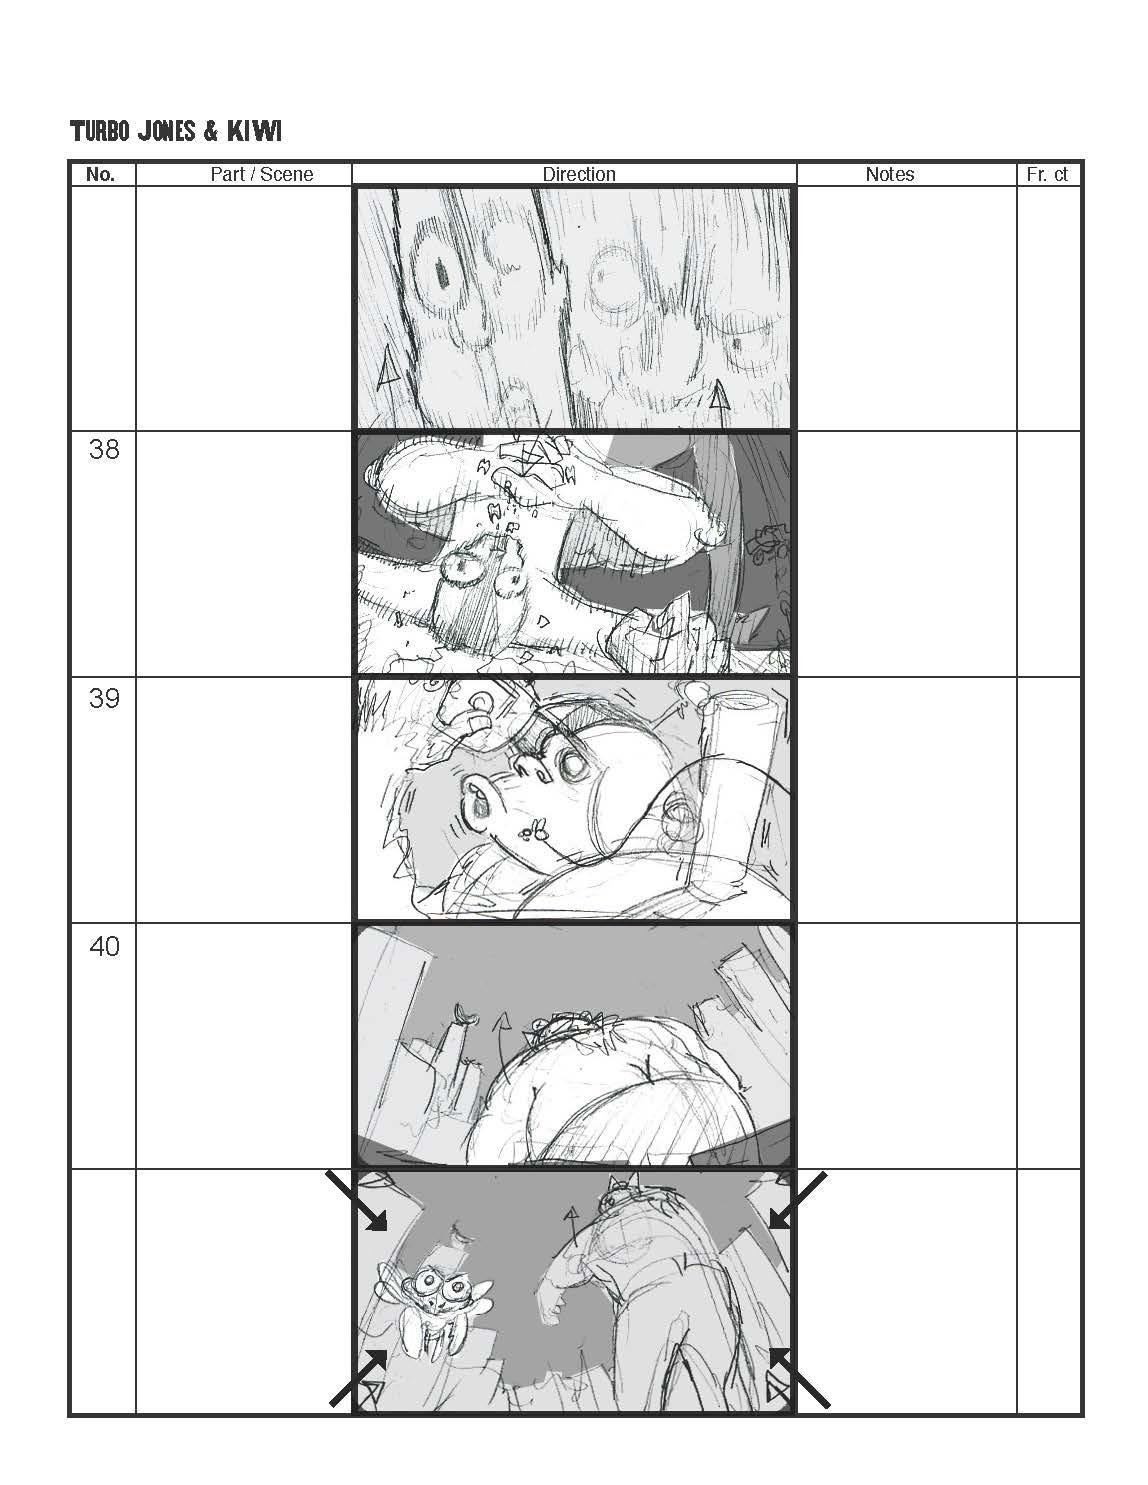 TJK_Storyboards_v01_HIGH_Page_21.jpg